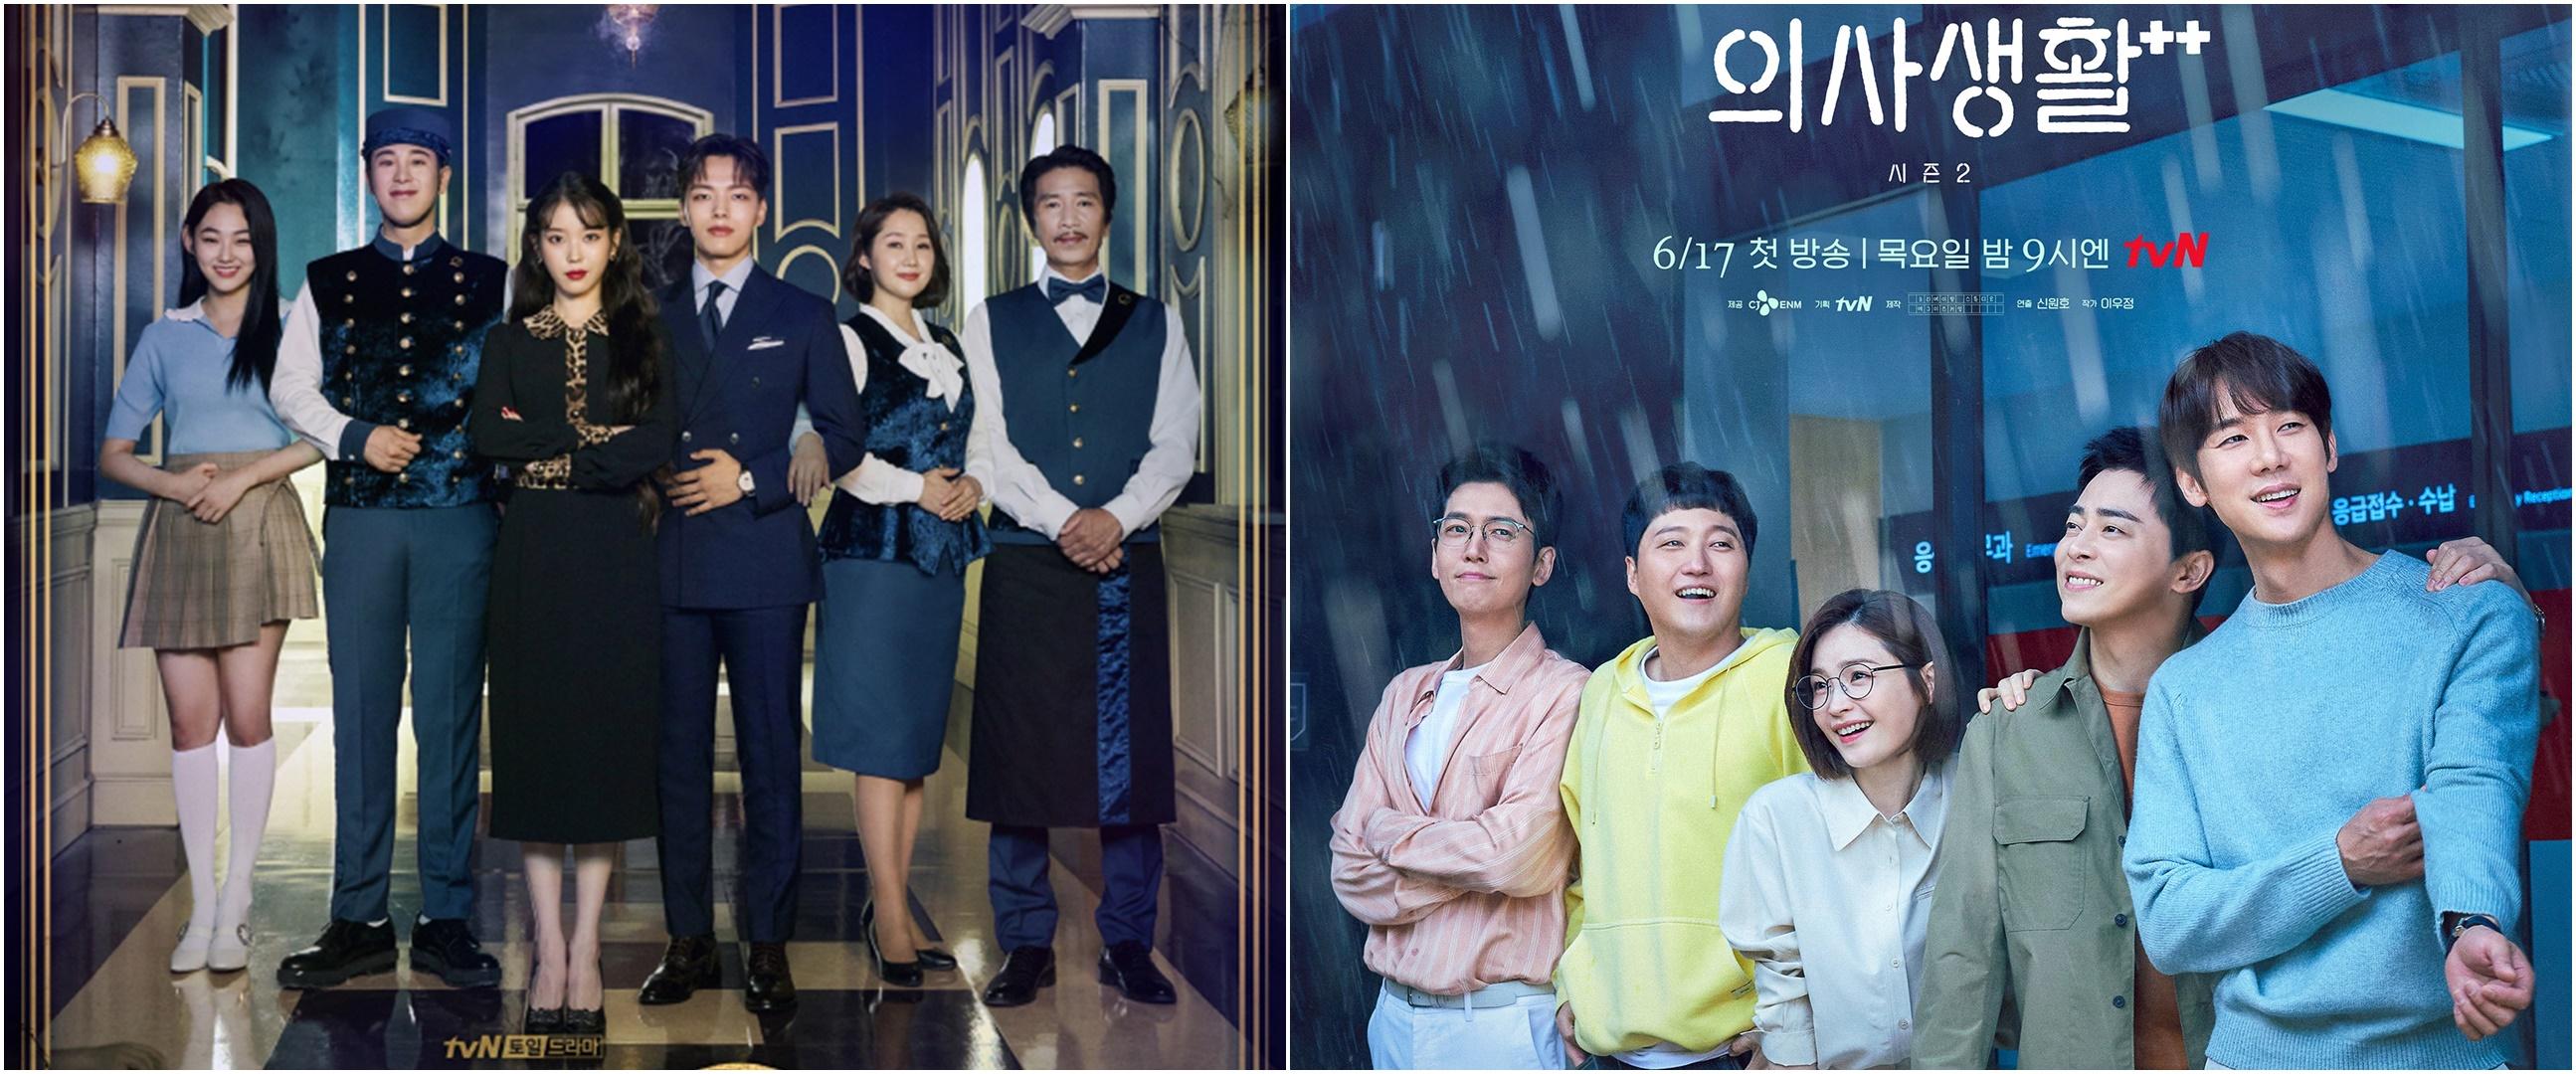 7 Drama Korea tvN paling digemari, alur cerita bikin geregetan